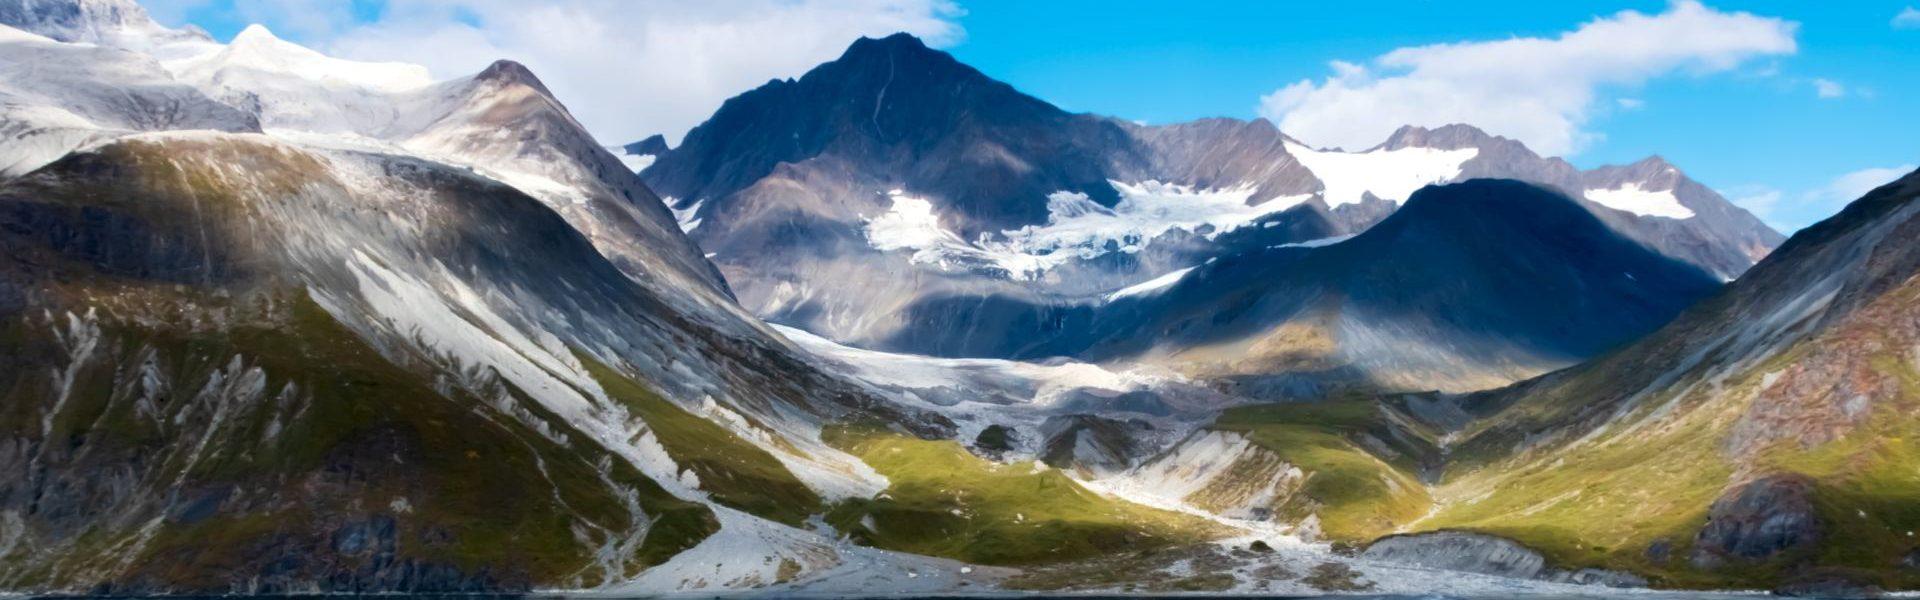 Glacier Bay National Park, Alaska, best of alaska